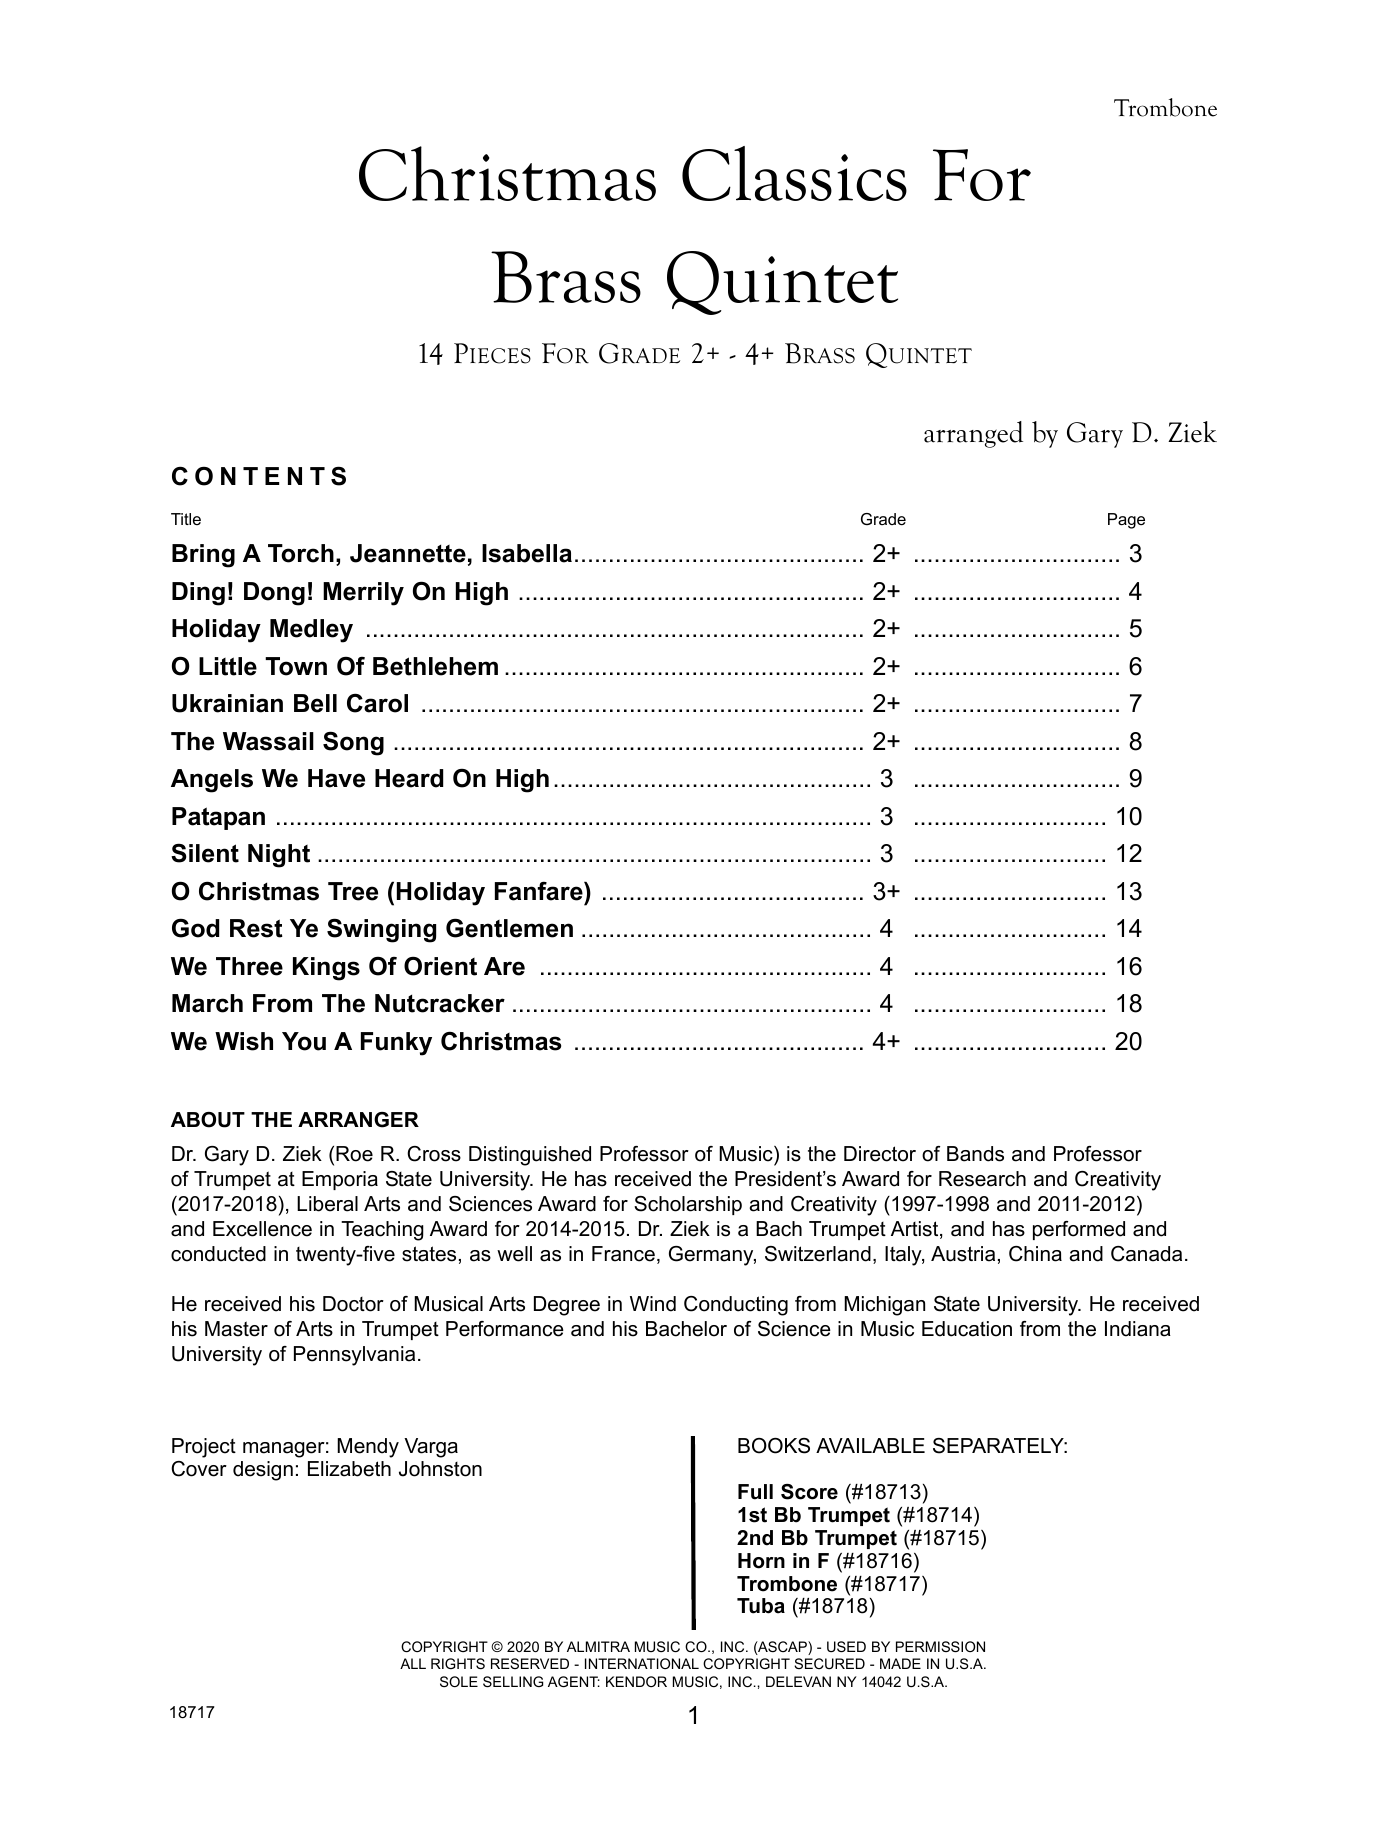 Christmas Classics For Brass Quintet - Trombone Sheet Music